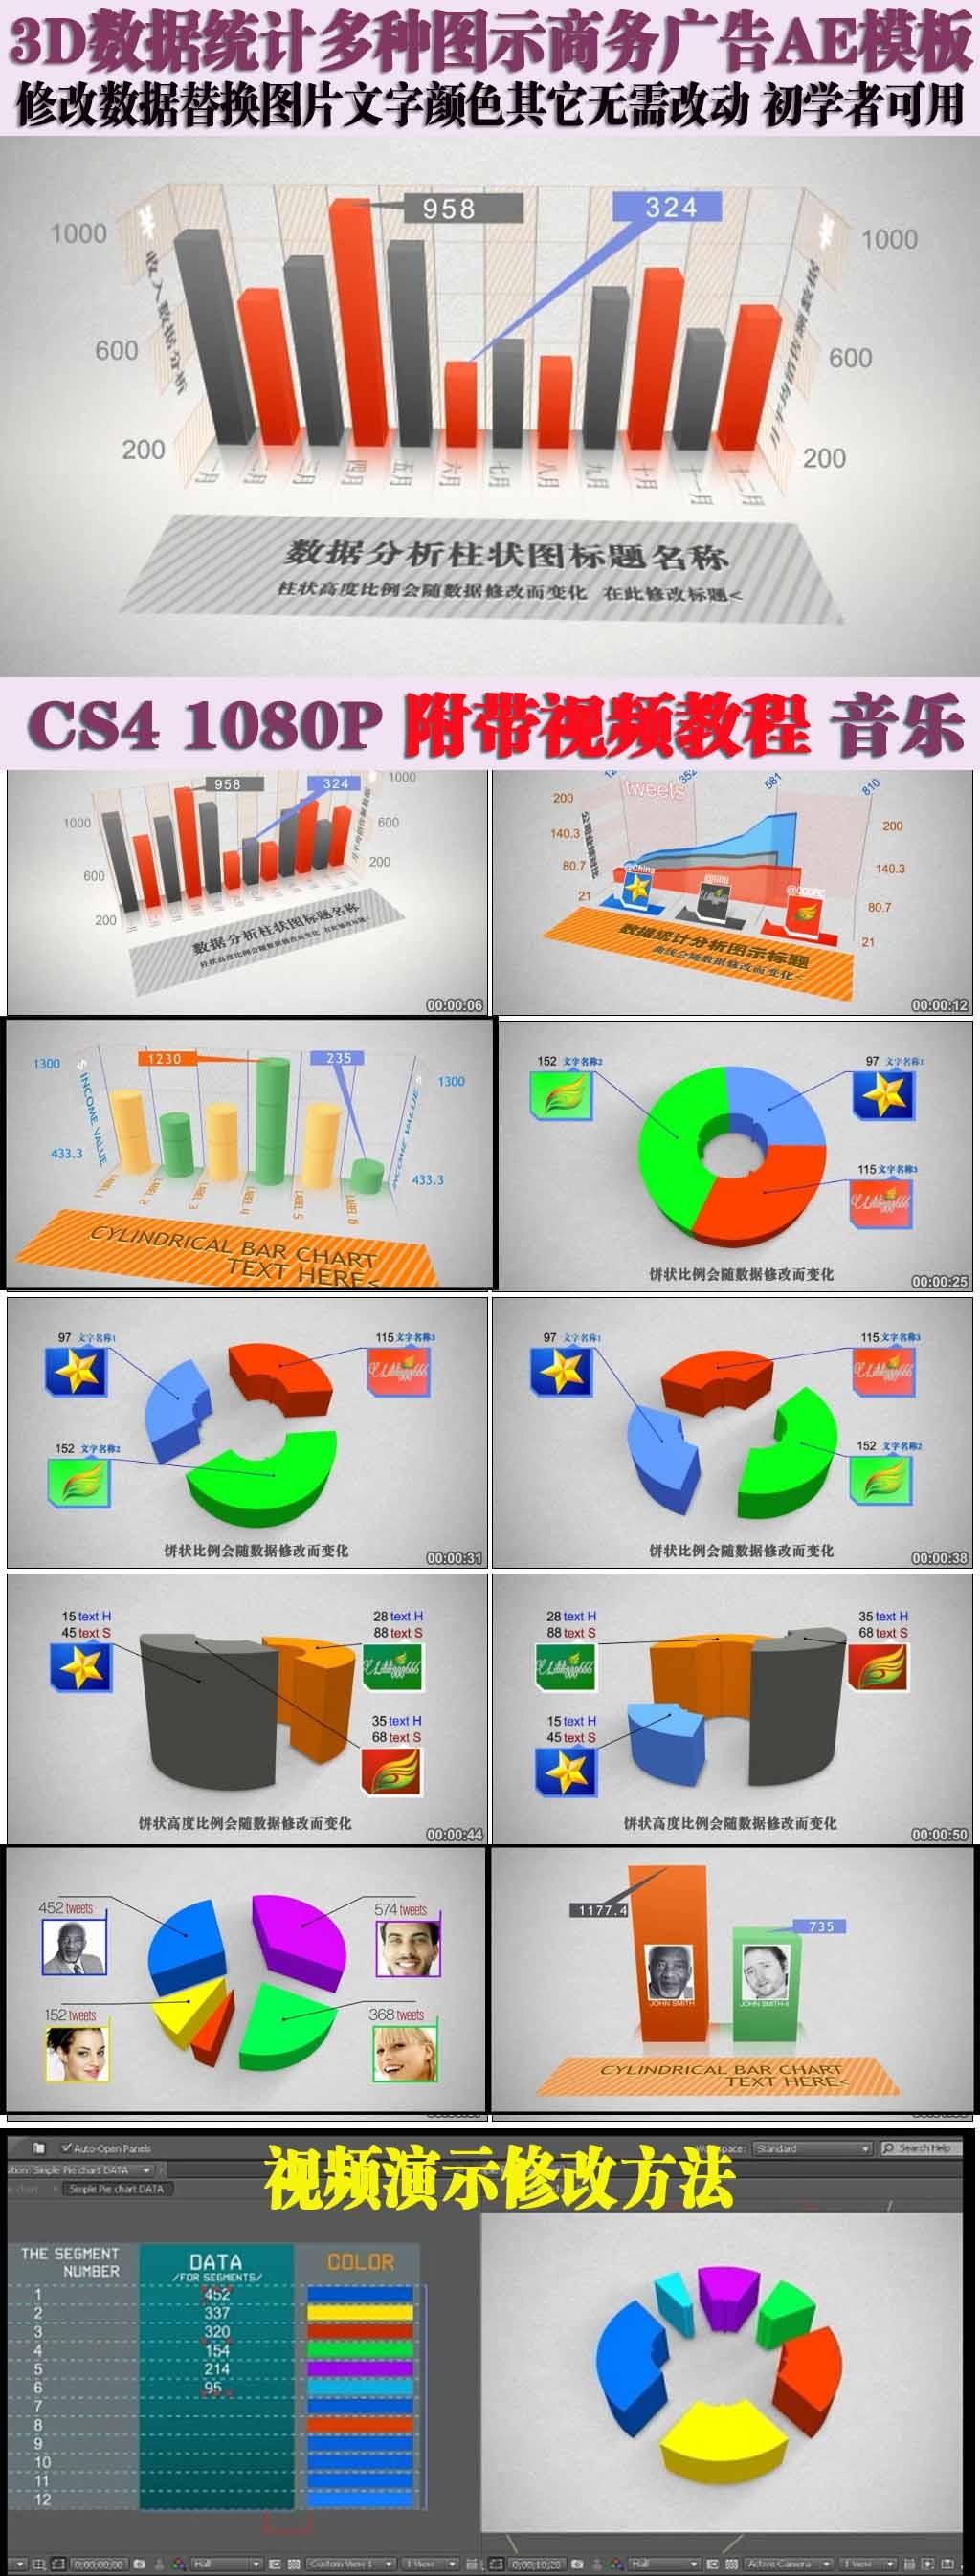 3d图表数据分析柱状饼状图ae模板